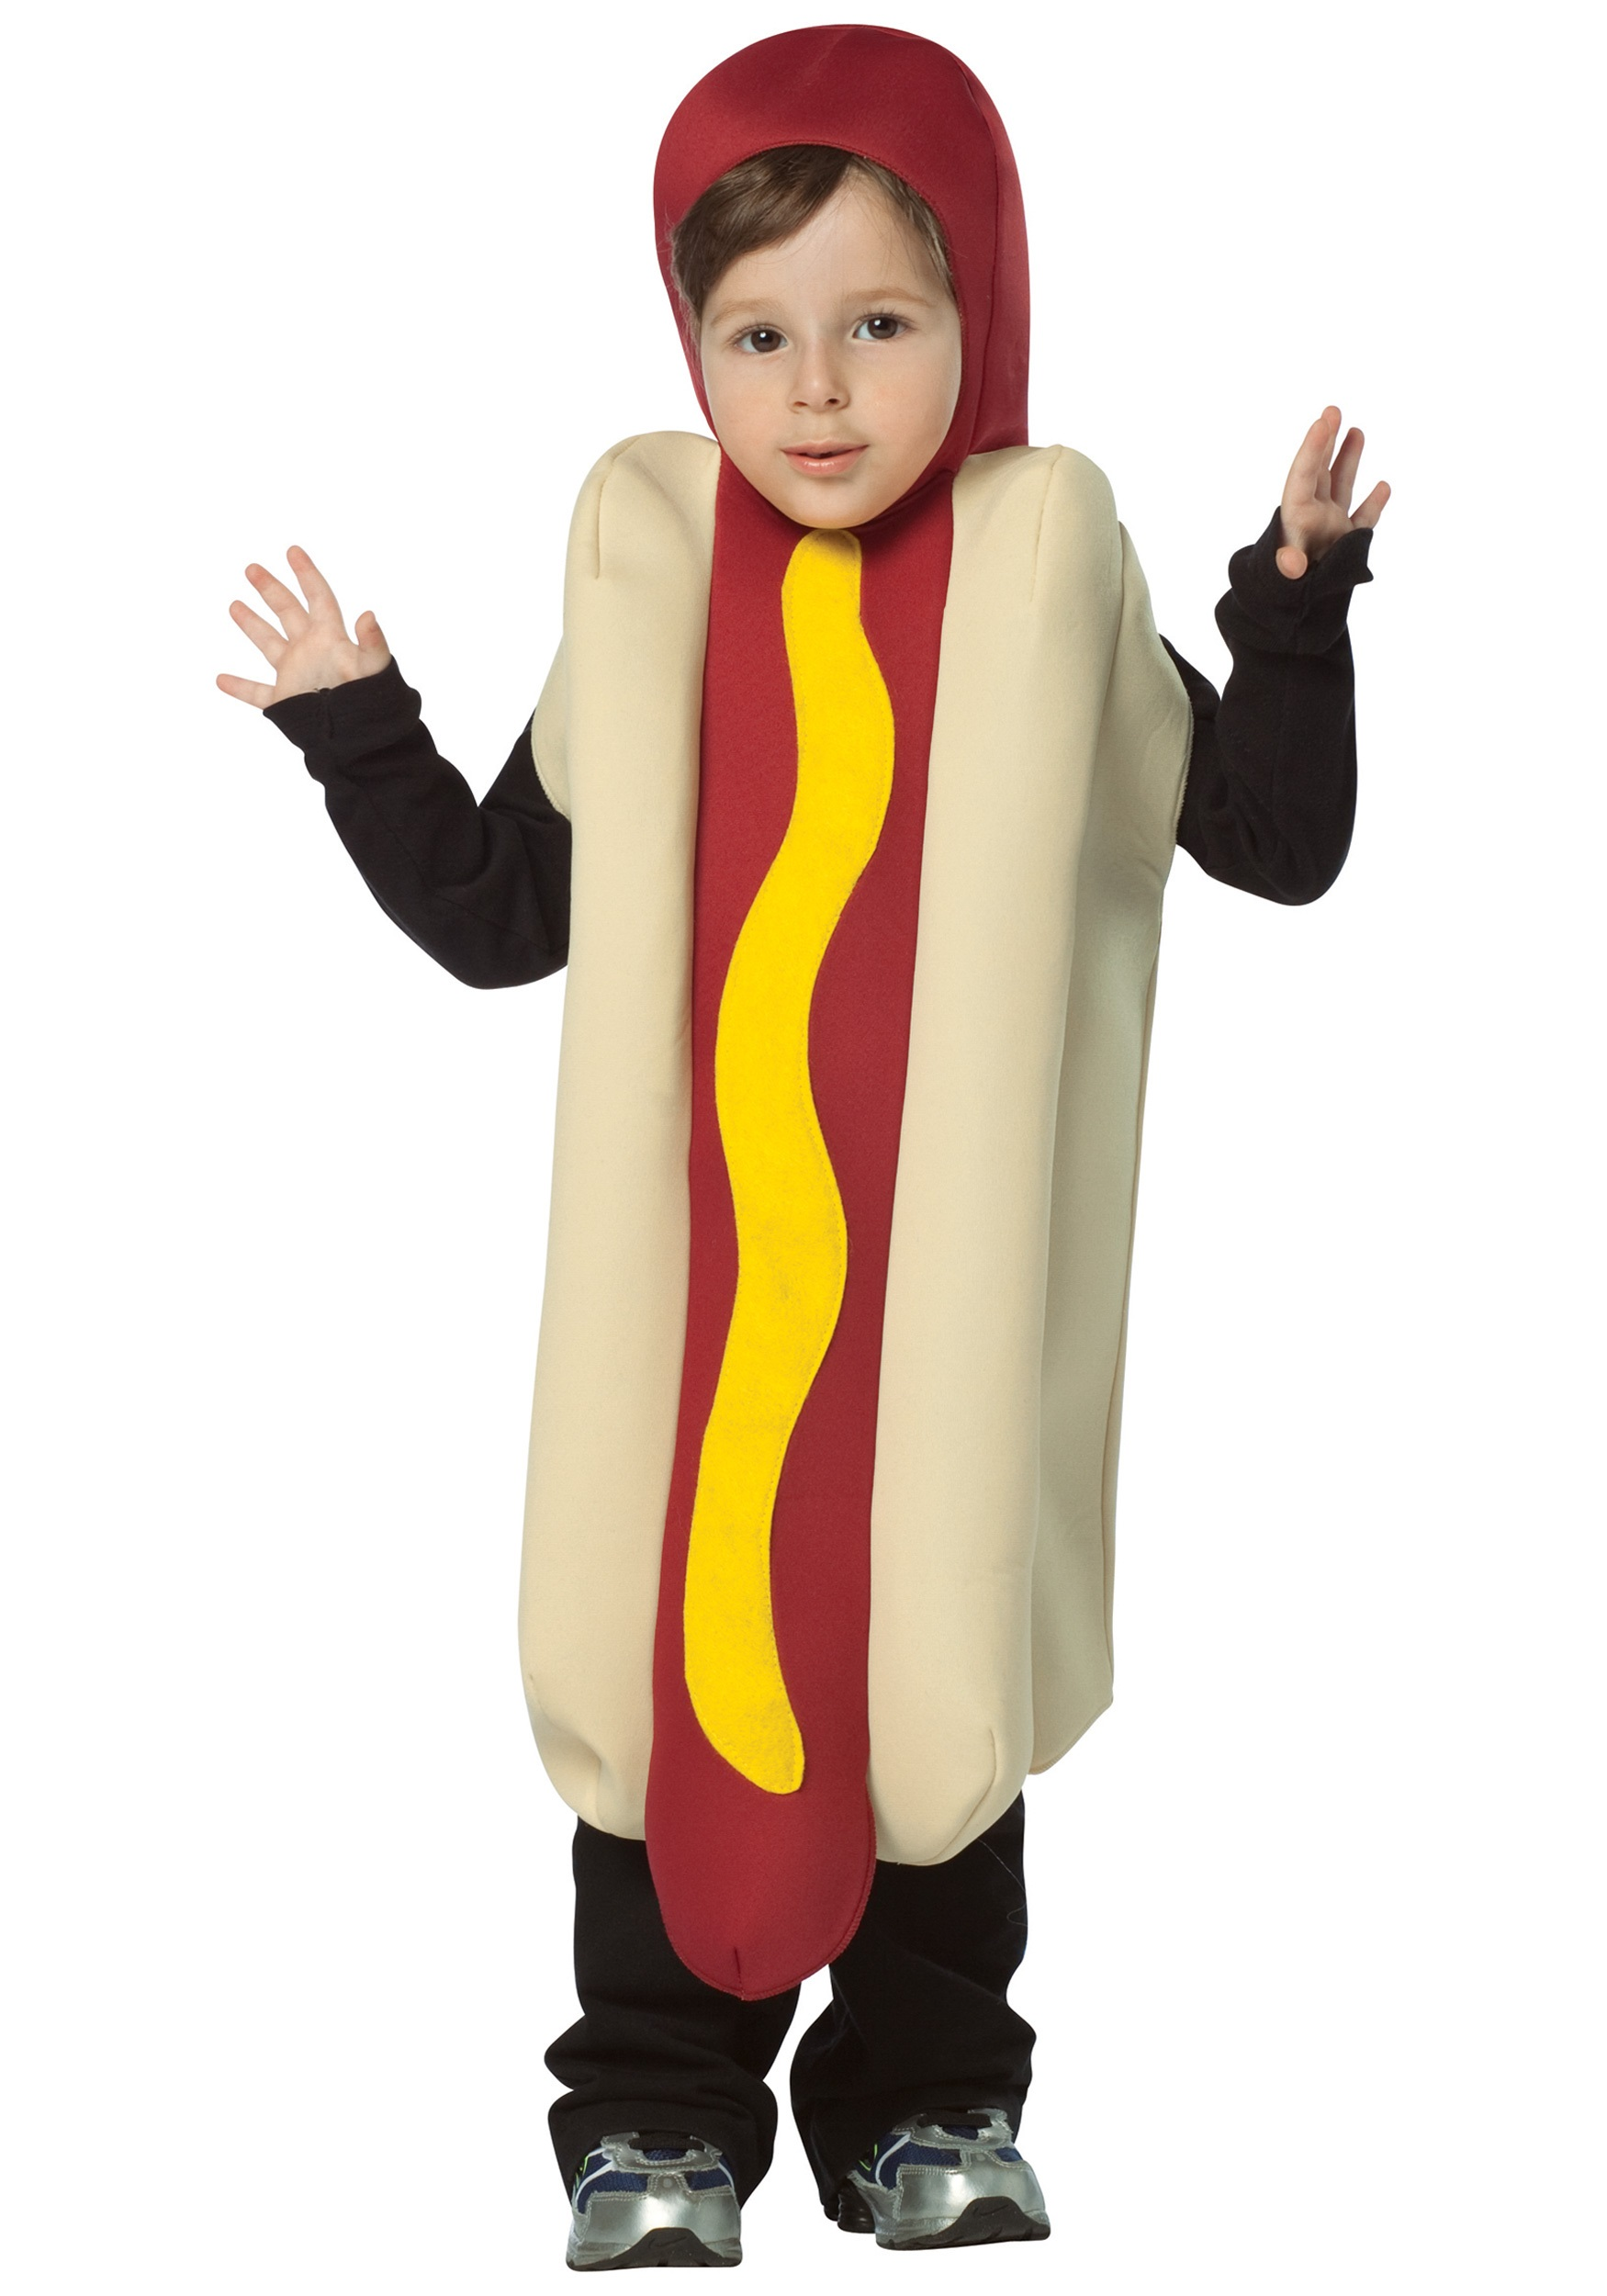 Toddler Hotdog Costume - Food Costumes, Funny Costumes Hot Dog Costume